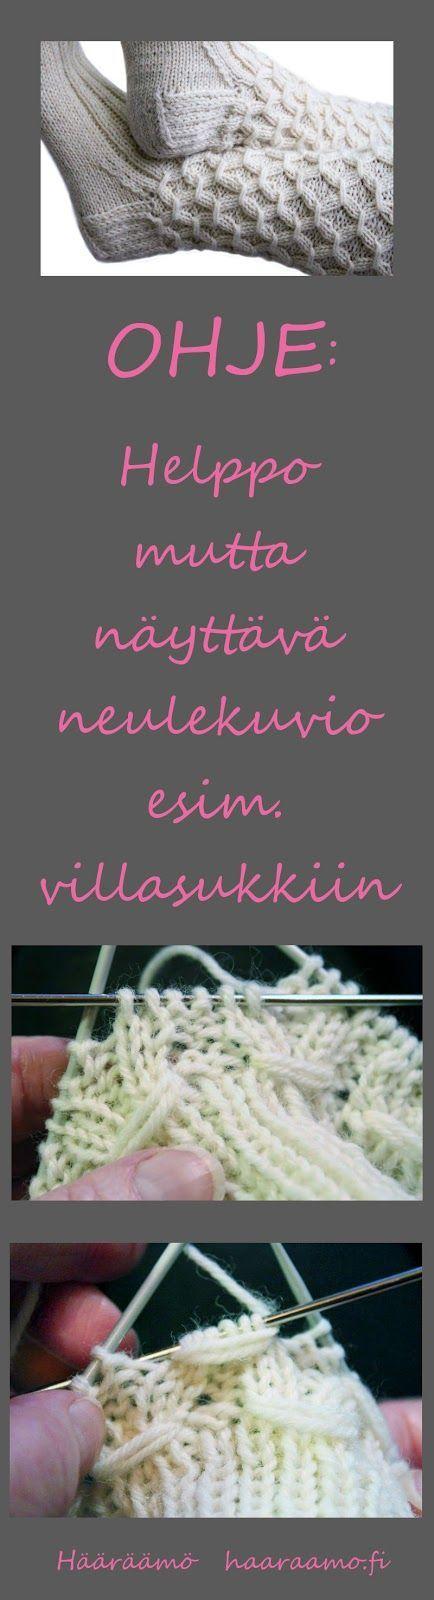 Neuleohje: lyhde, smokkineule, rypytetty joustinneule